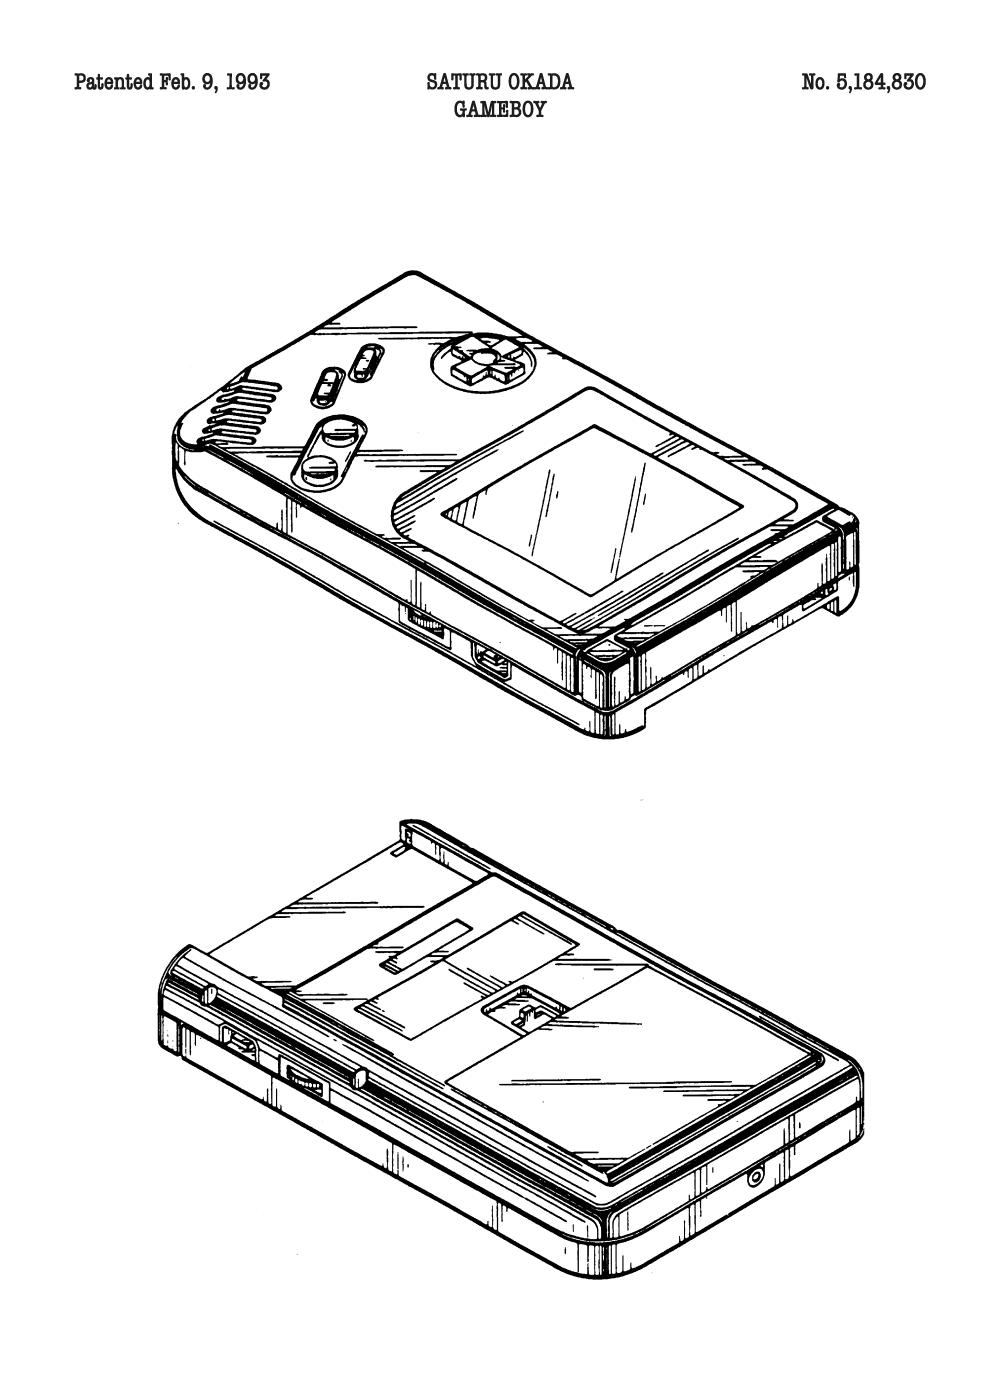 Gameboy plakat - Original patent tegning